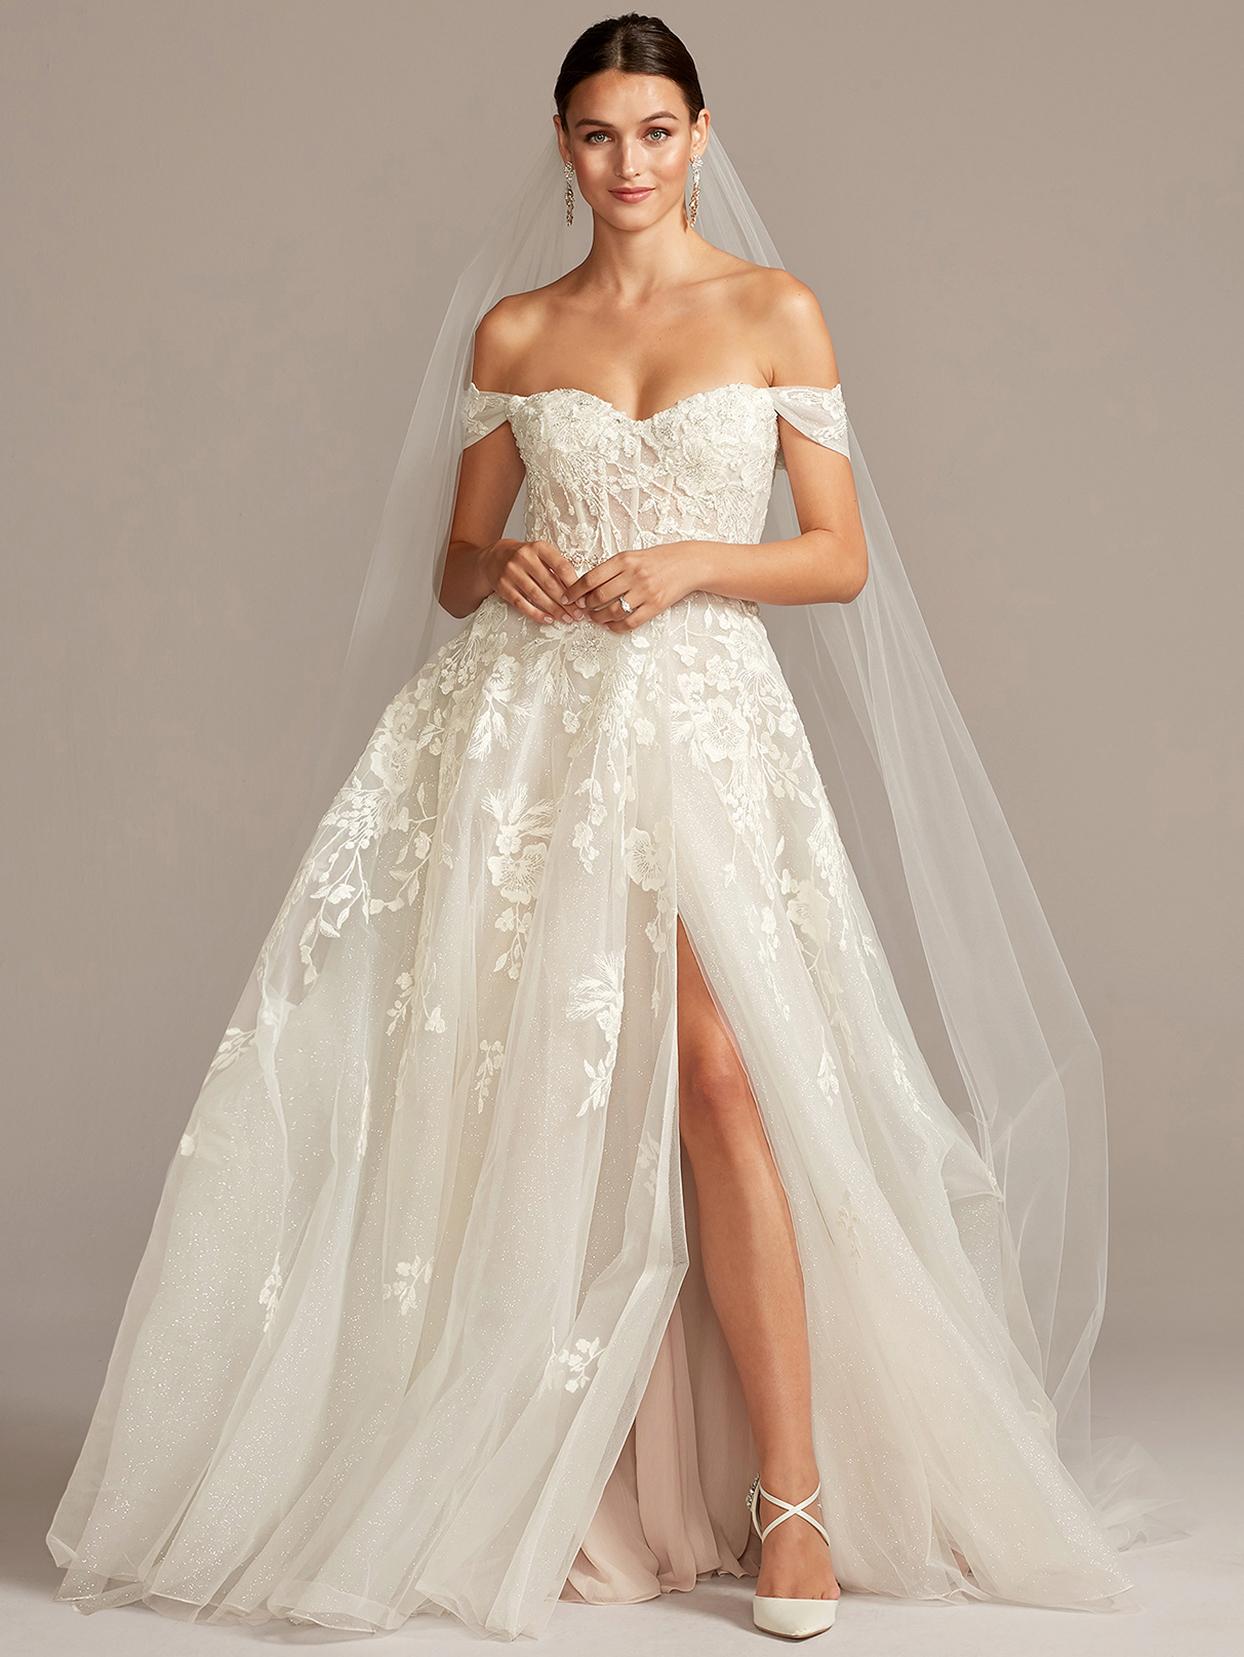 davids bridal galina off-the-shoulder ball gown wedding dress fall 2020